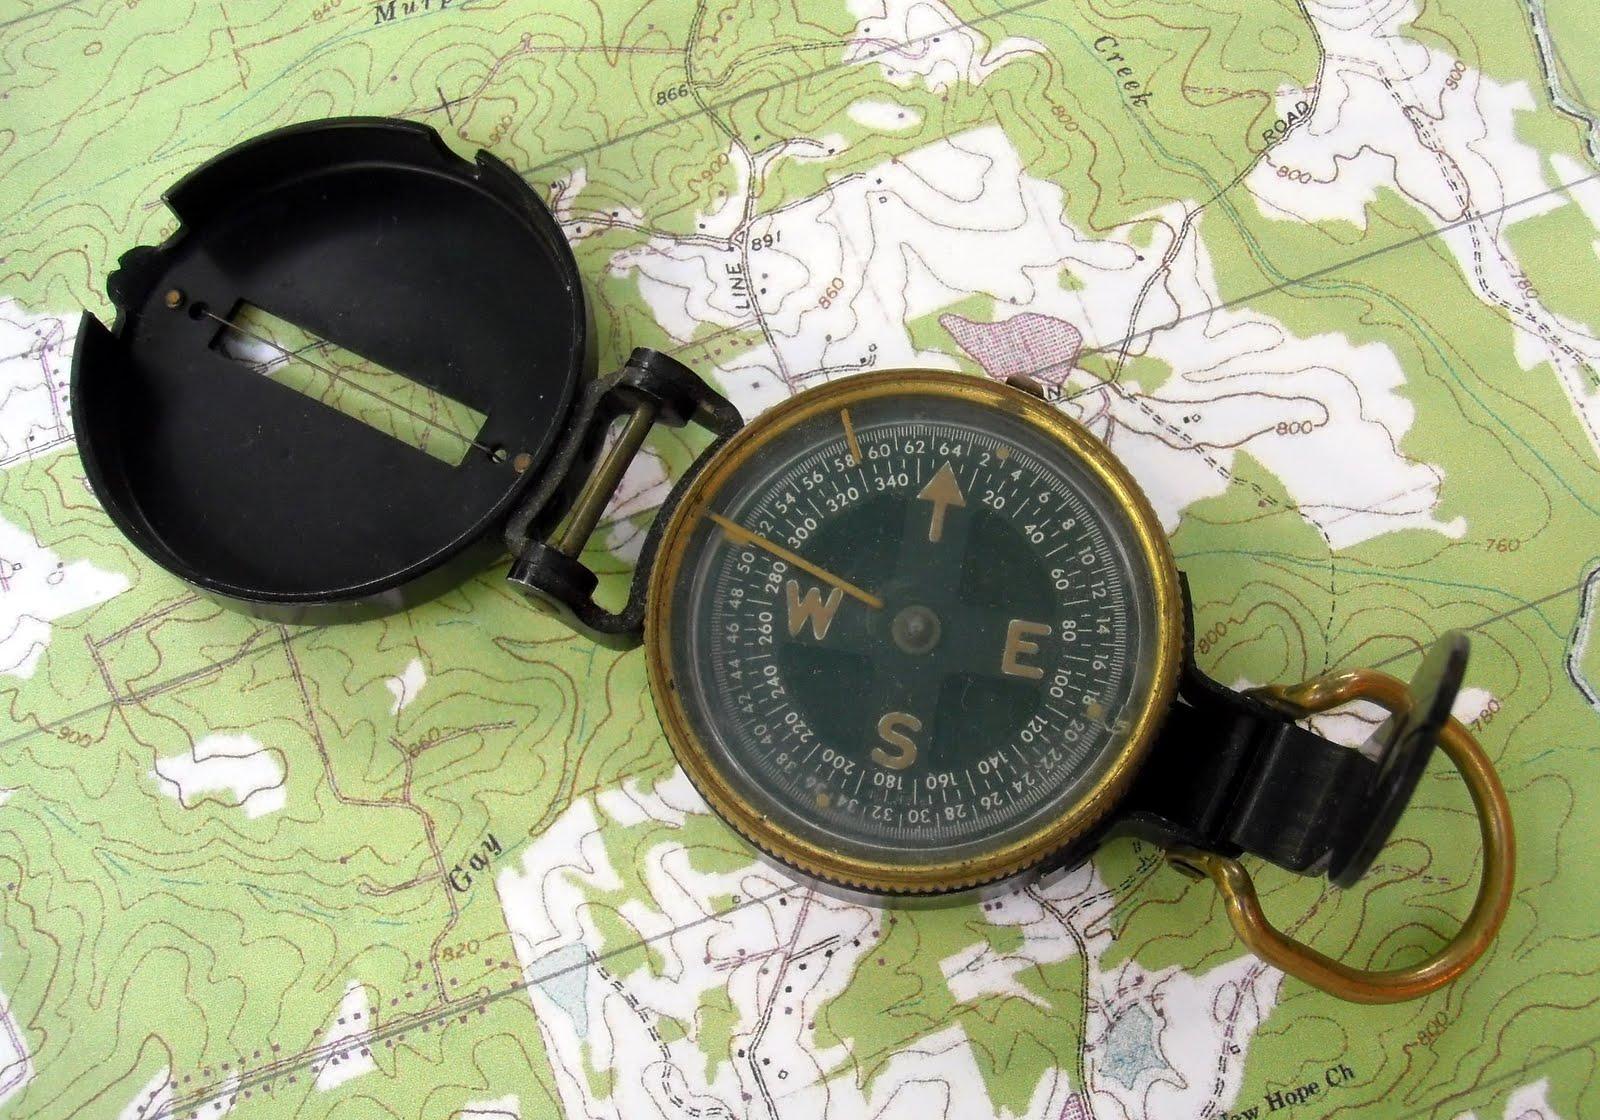 A Model 1938 M1938 lensatic compass manufactured